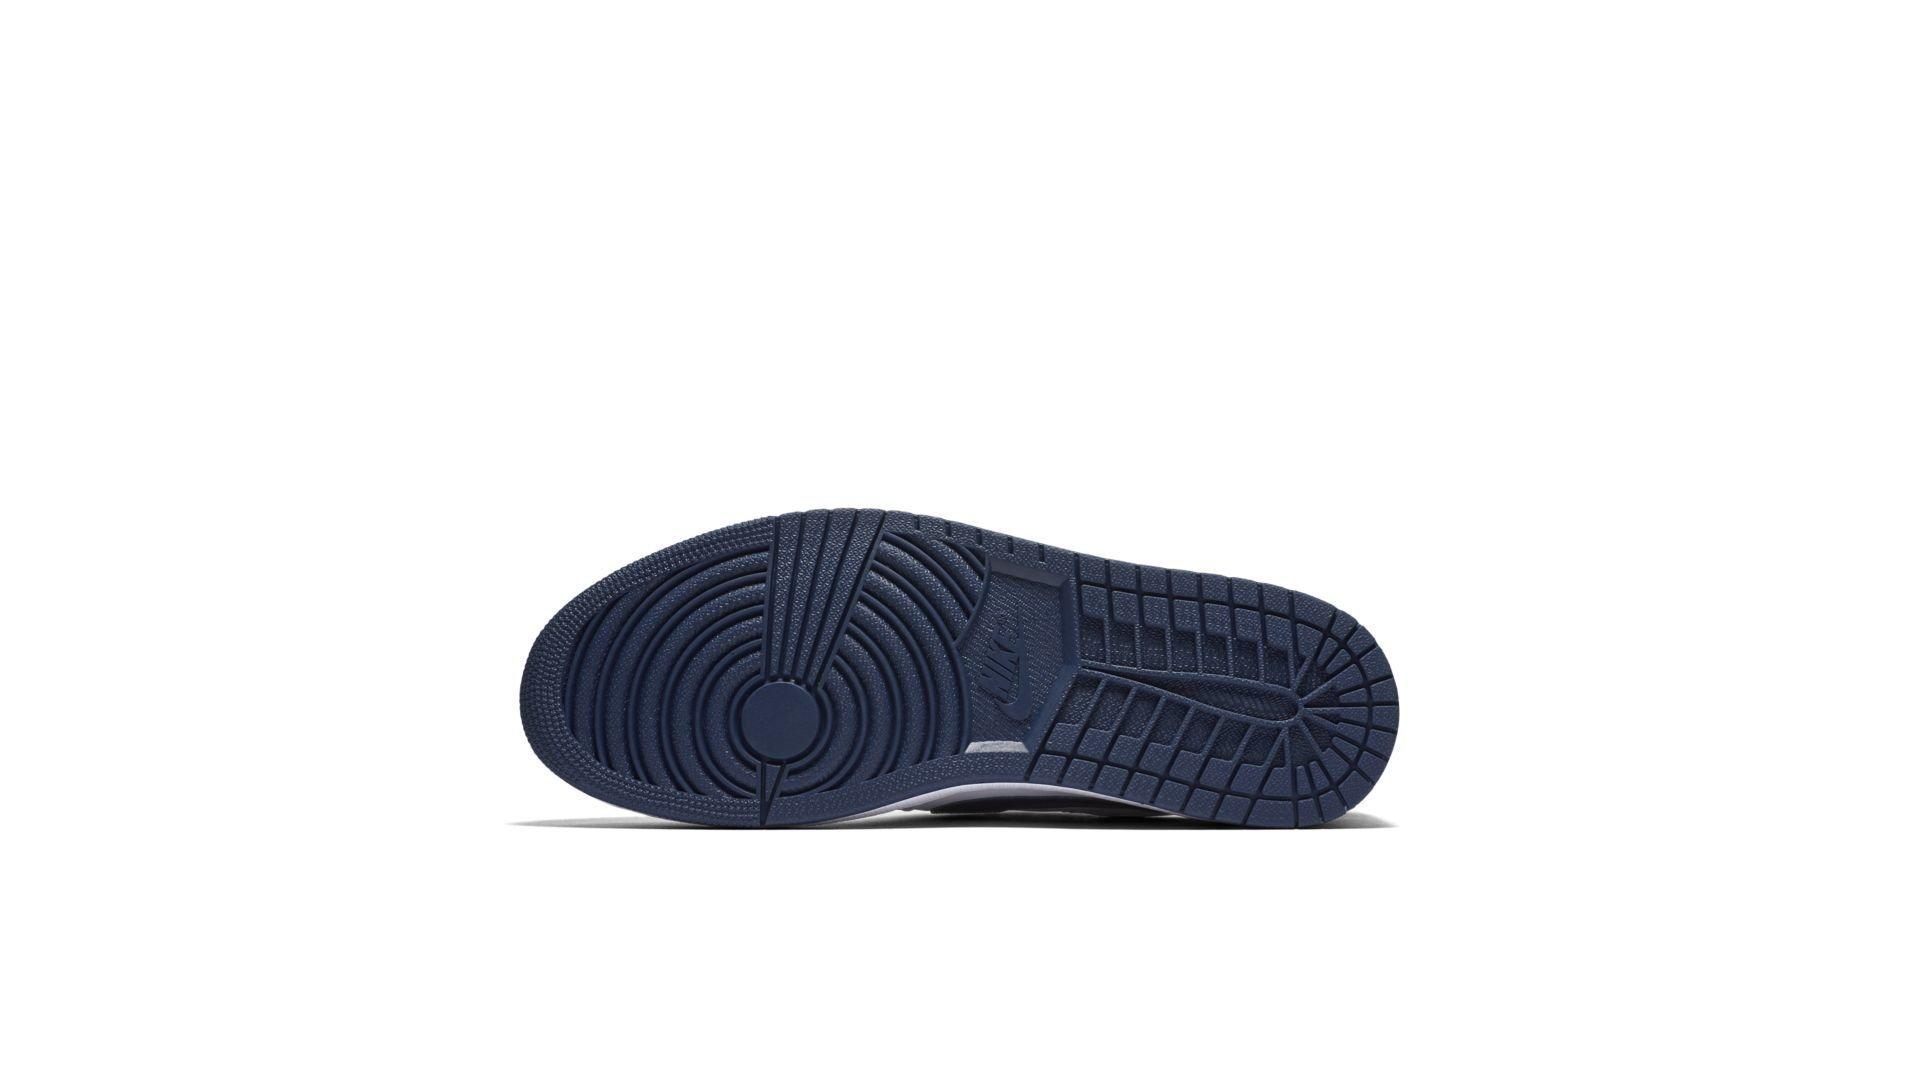 Jordan 1 Retro Low Metallic Blue (705329-106)